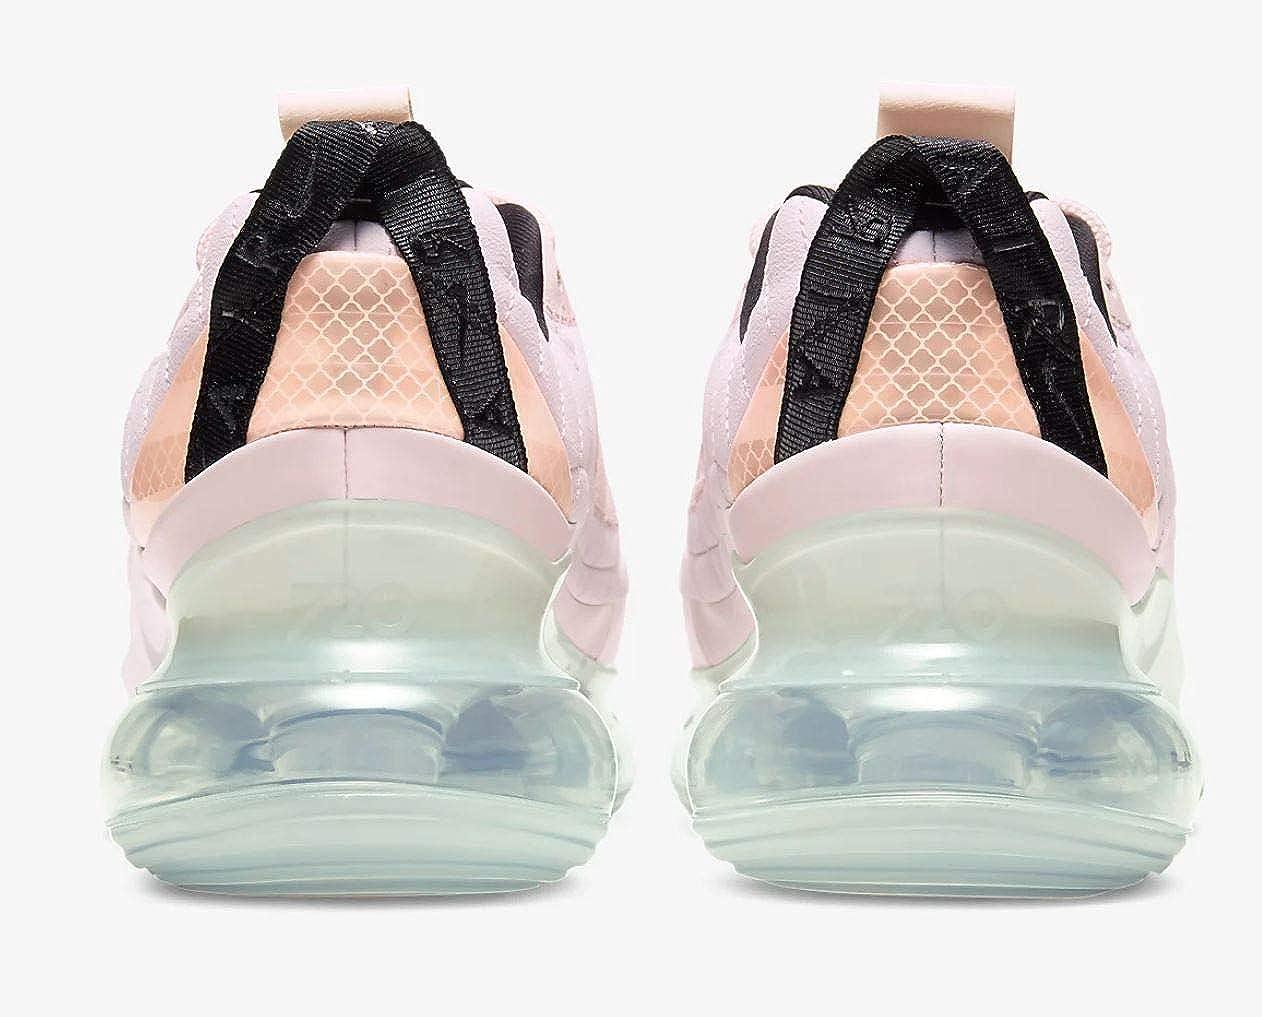 Nike W Mx-720-818, Scarpe da Corsa Donna Light Violet Black Barely Rose